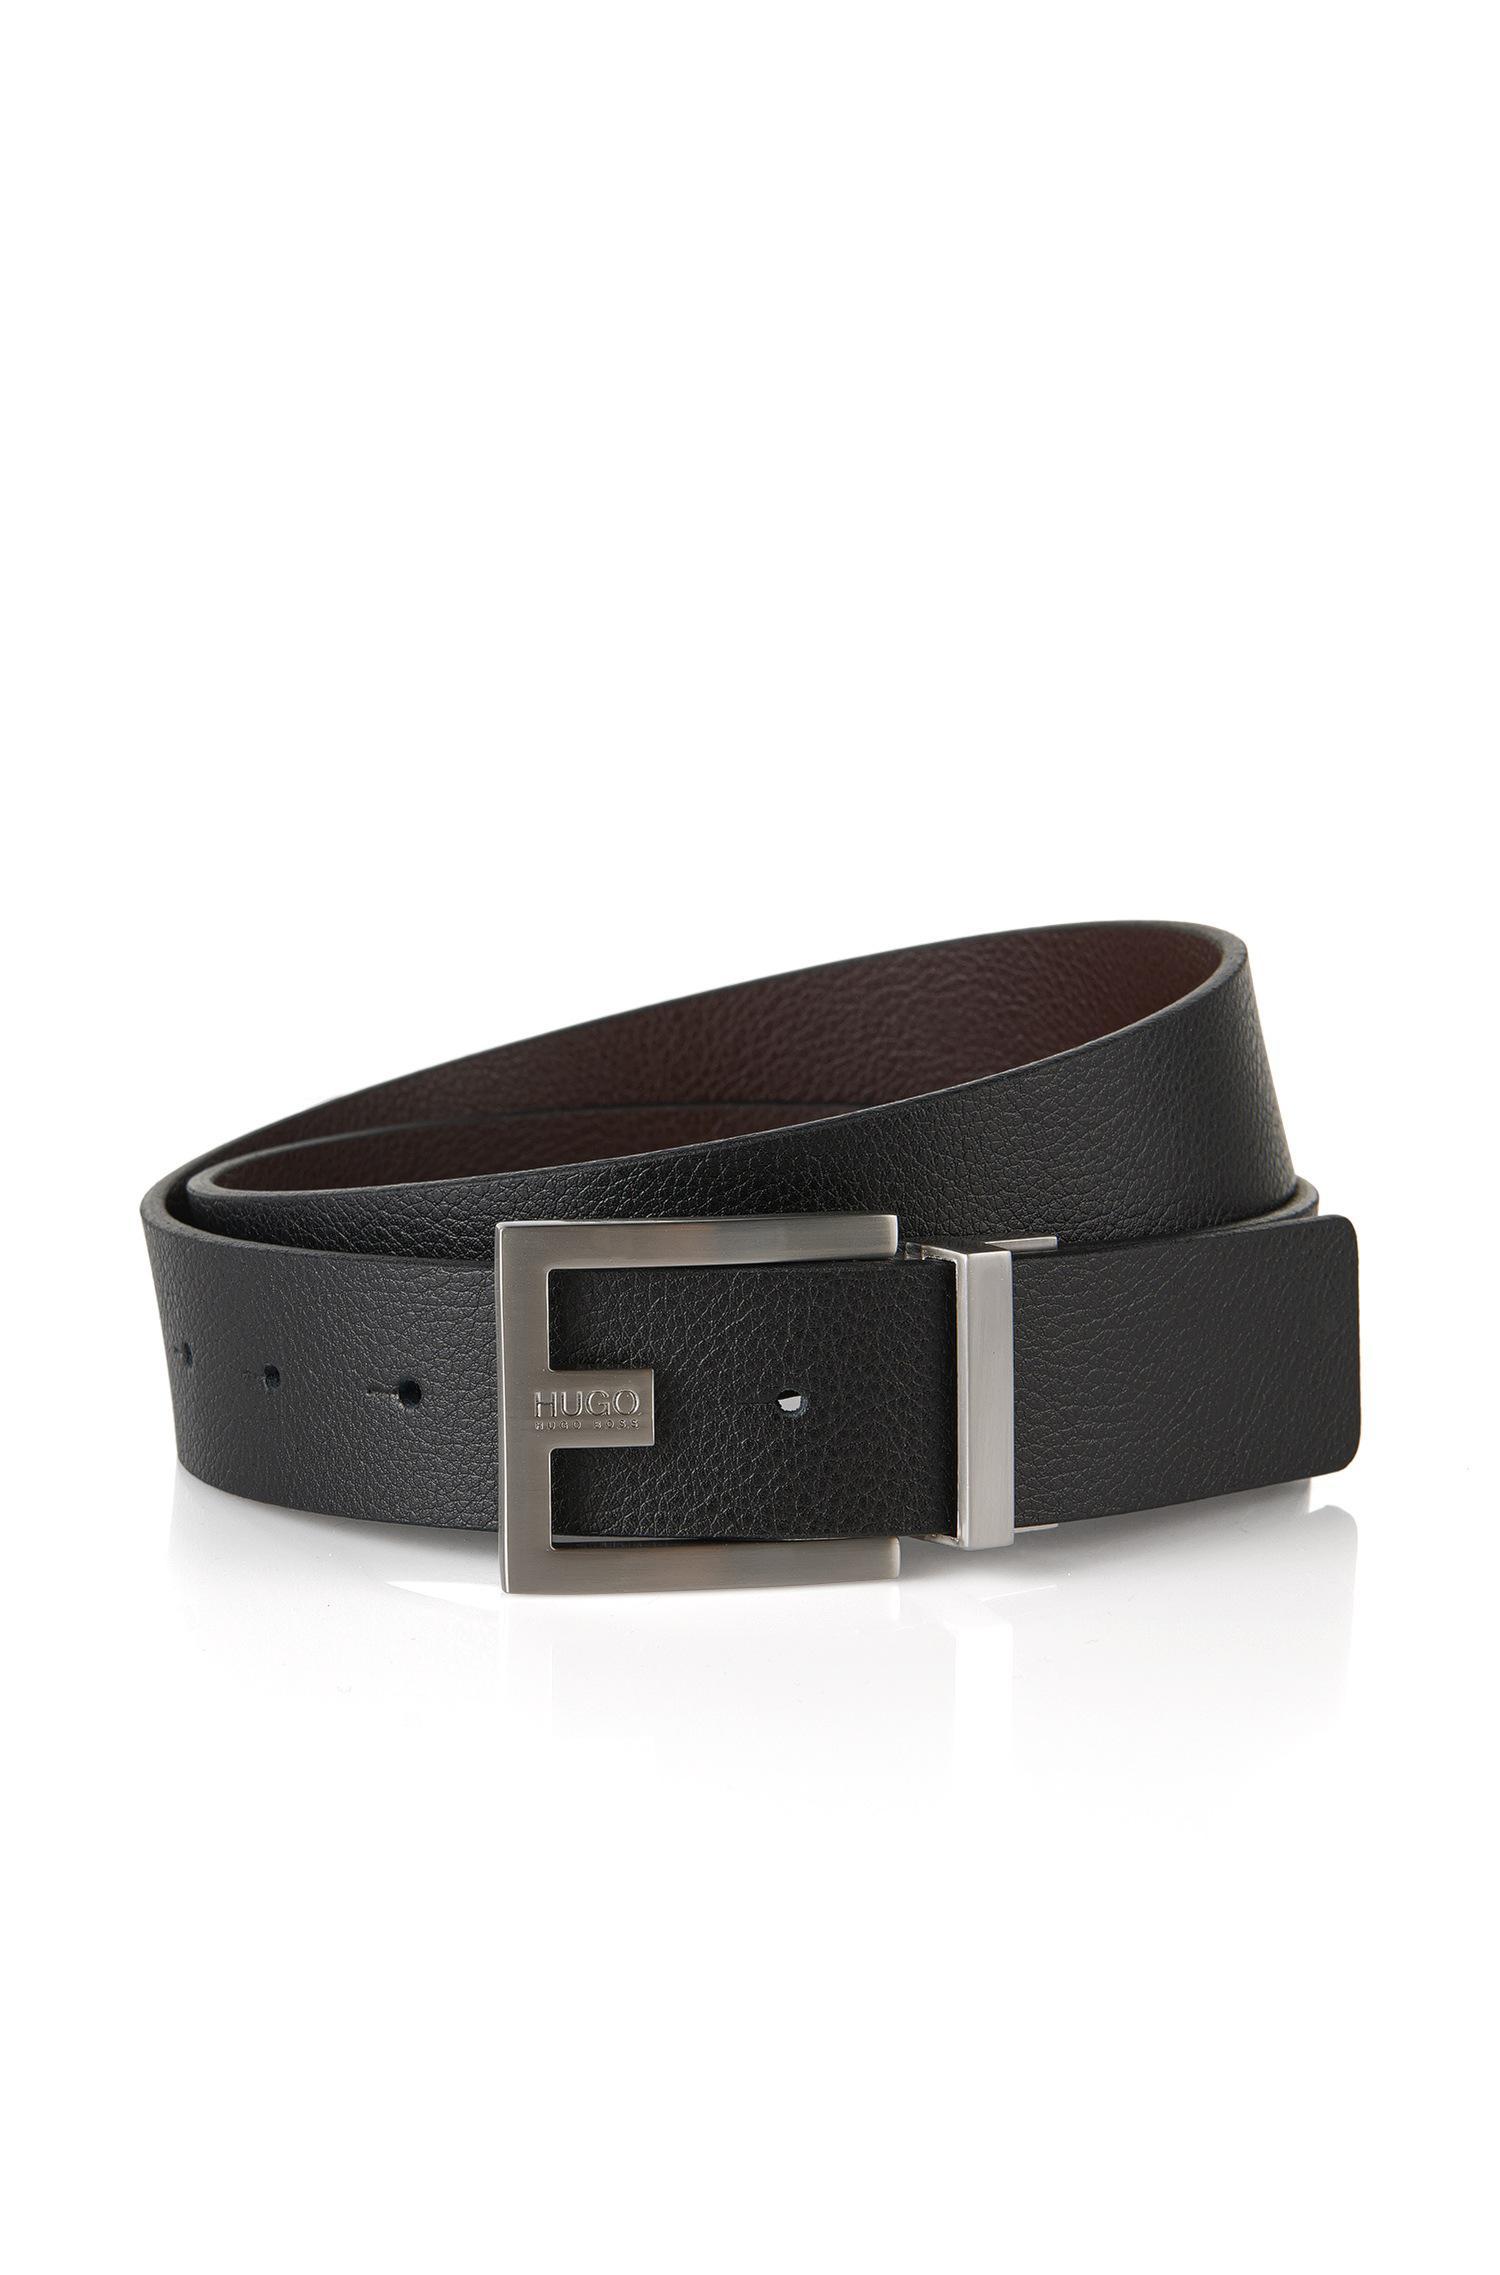 534ac0960006 Lyst - Hugo Reversible Belt In Grained Leather   c-fleming  in Black ...